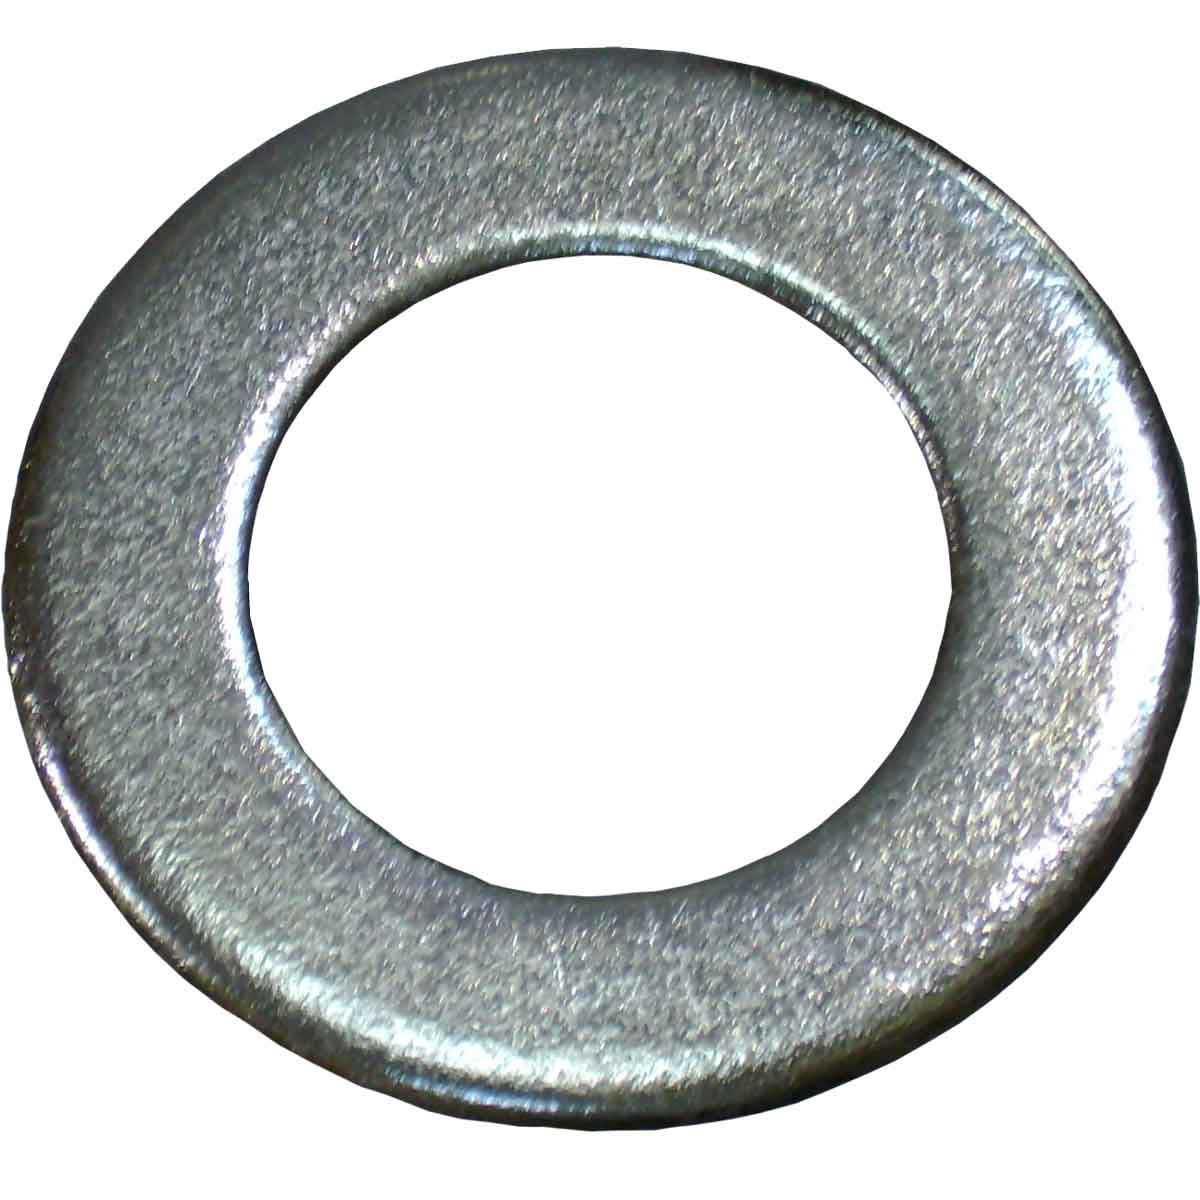 CS Unitec Scarifier milling Cutter